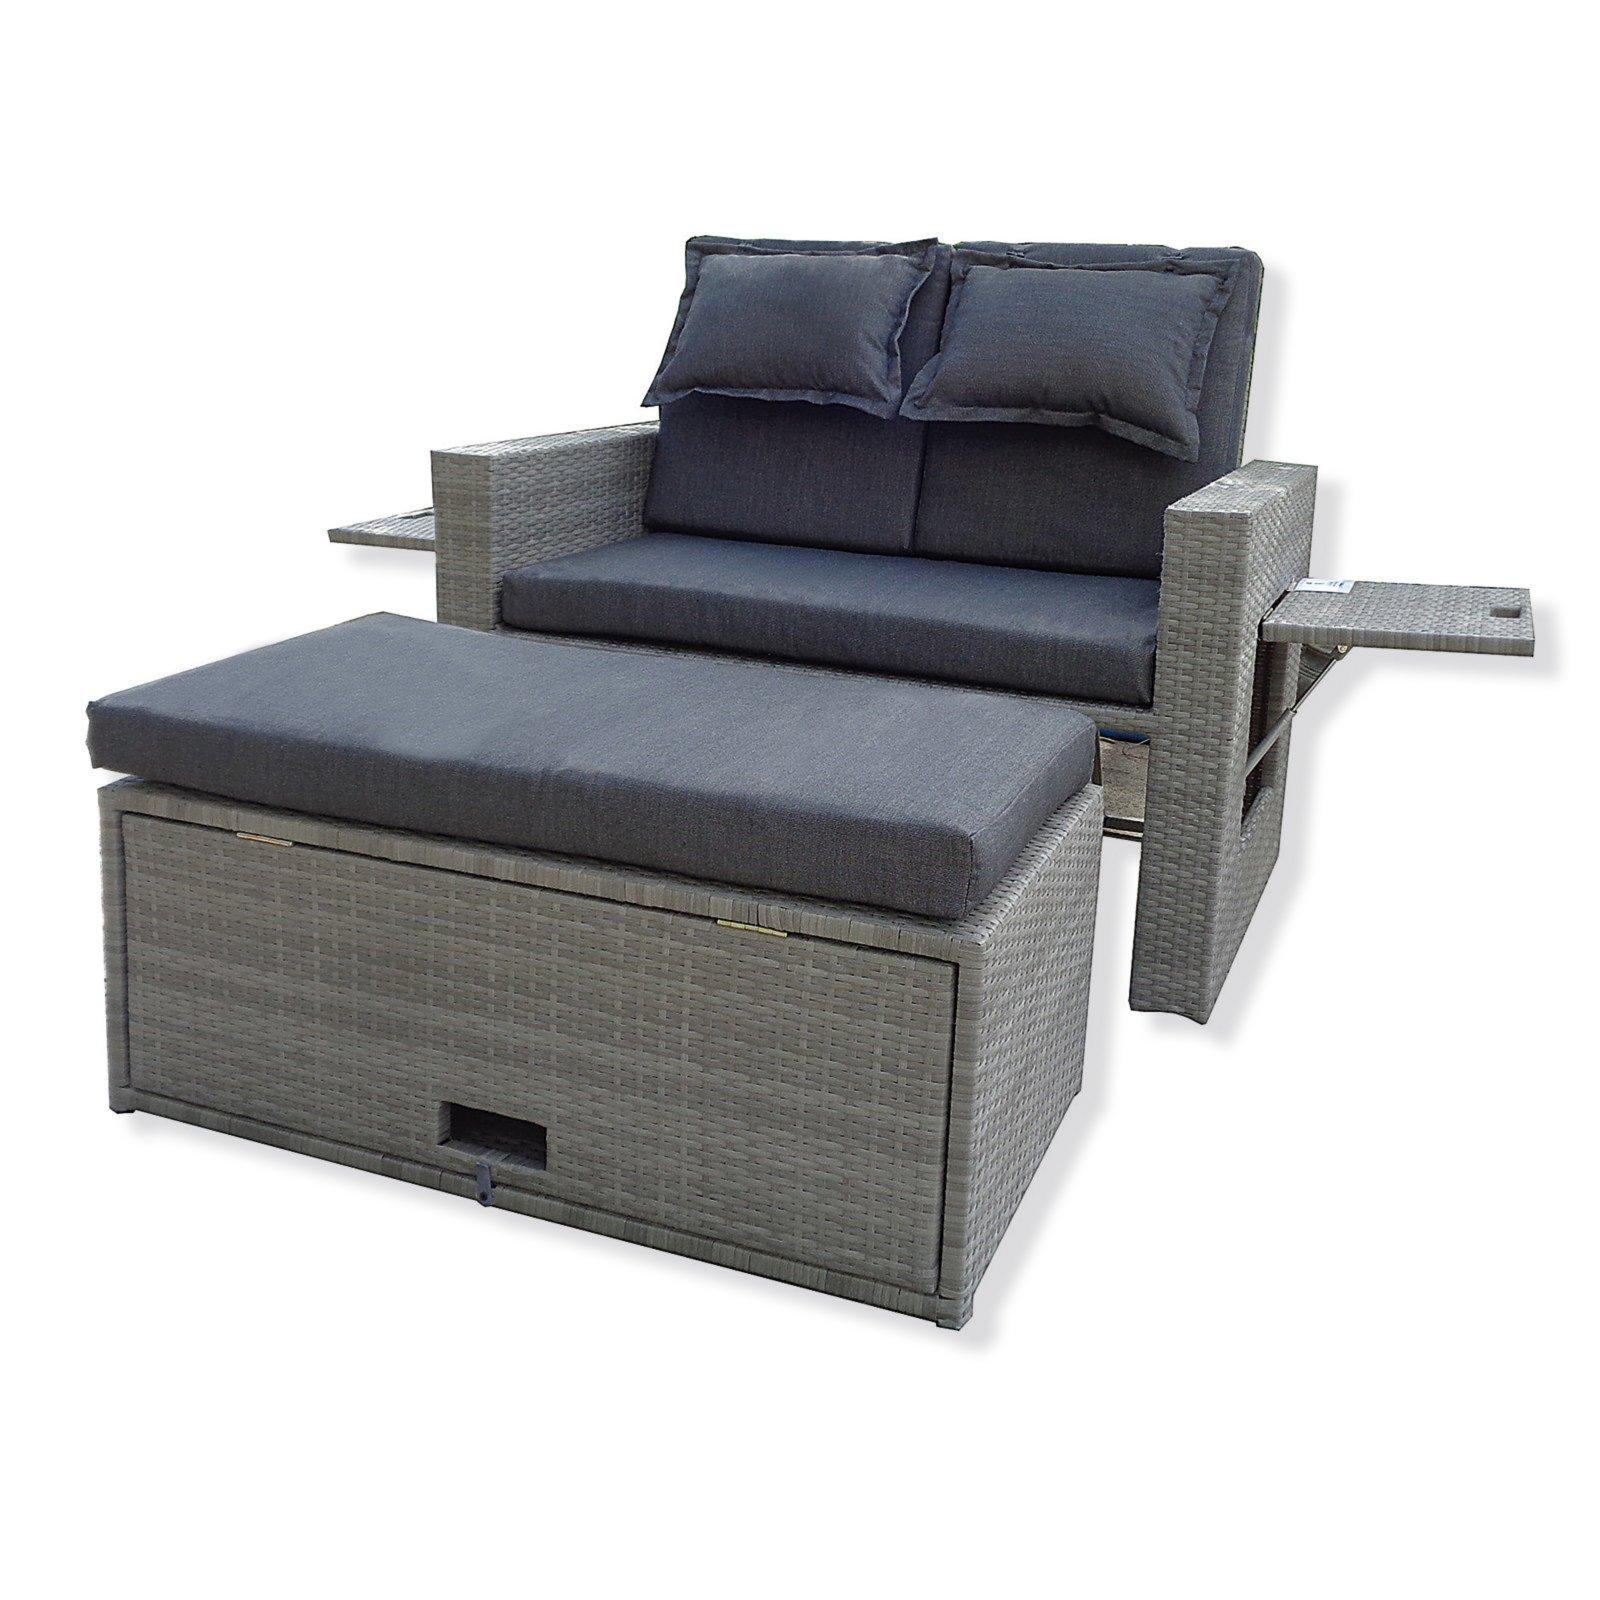 roller gartensofa ibiza grau rattanoptik mit hocker ebay. Black Bedroom Furniture Sets. Home Design Ideas